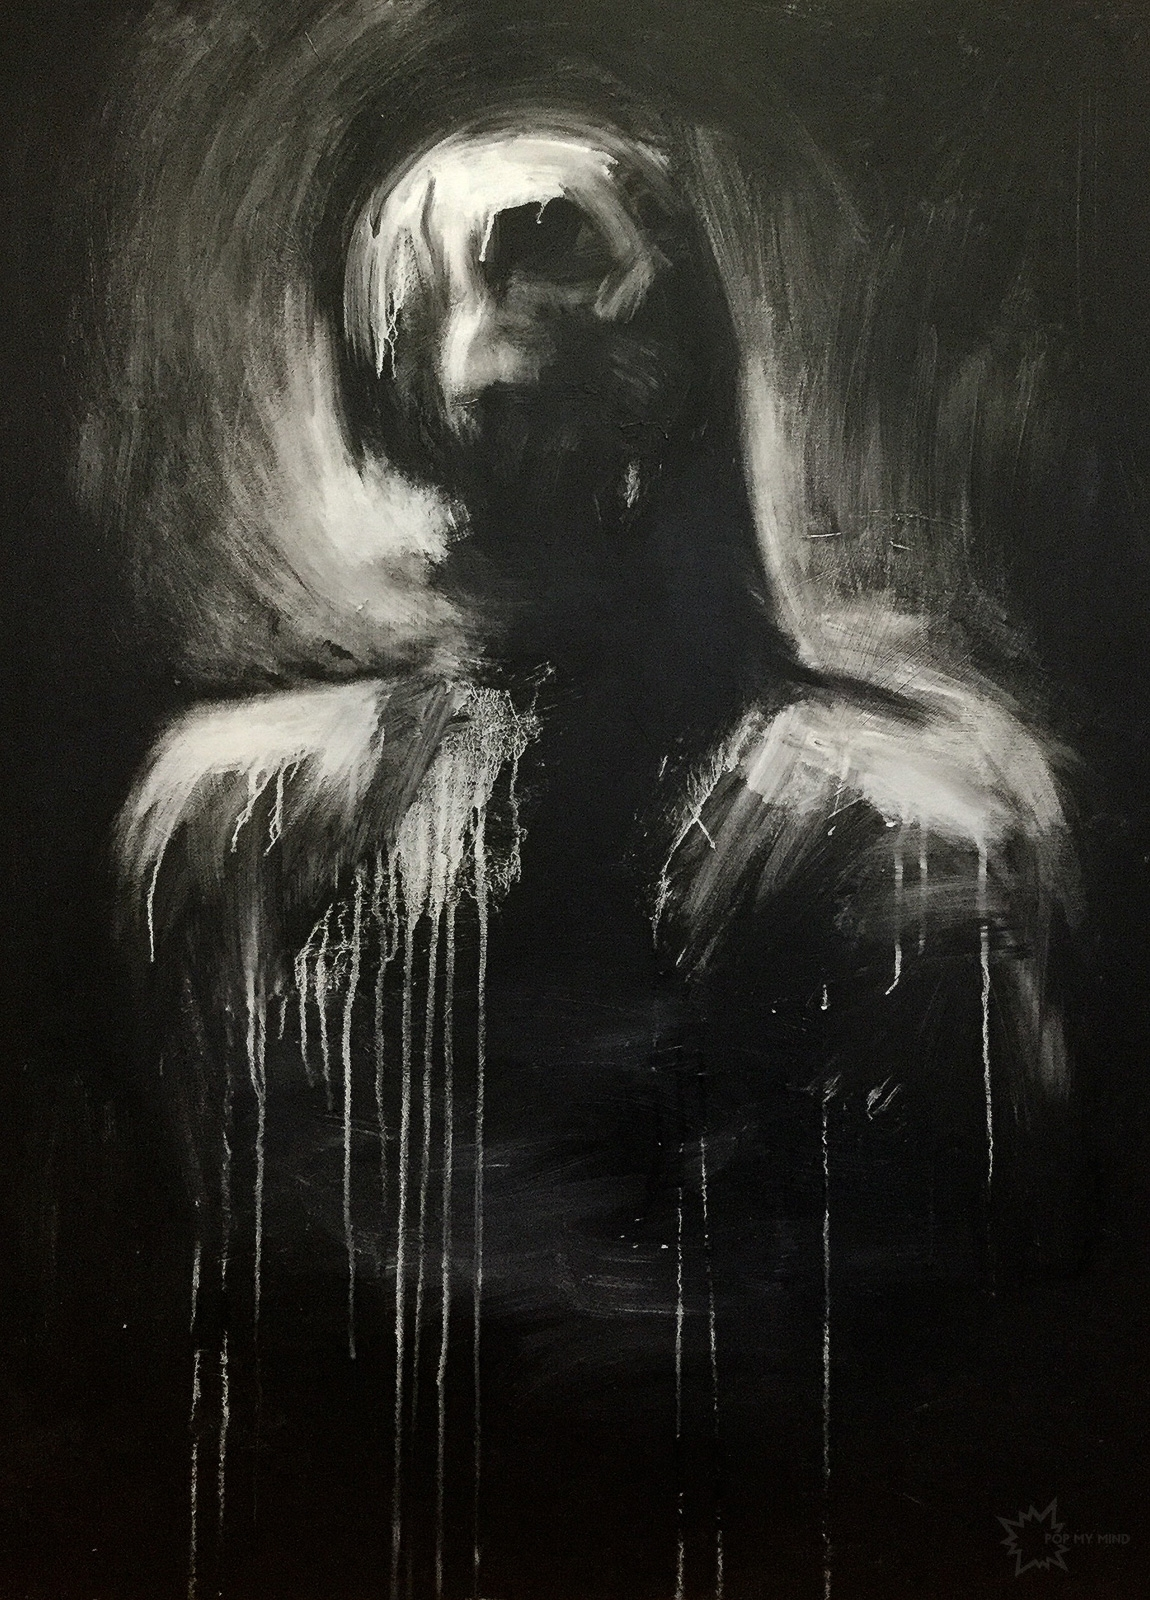 Untitled Adam Riches. Acrylic c - popmymind | ello